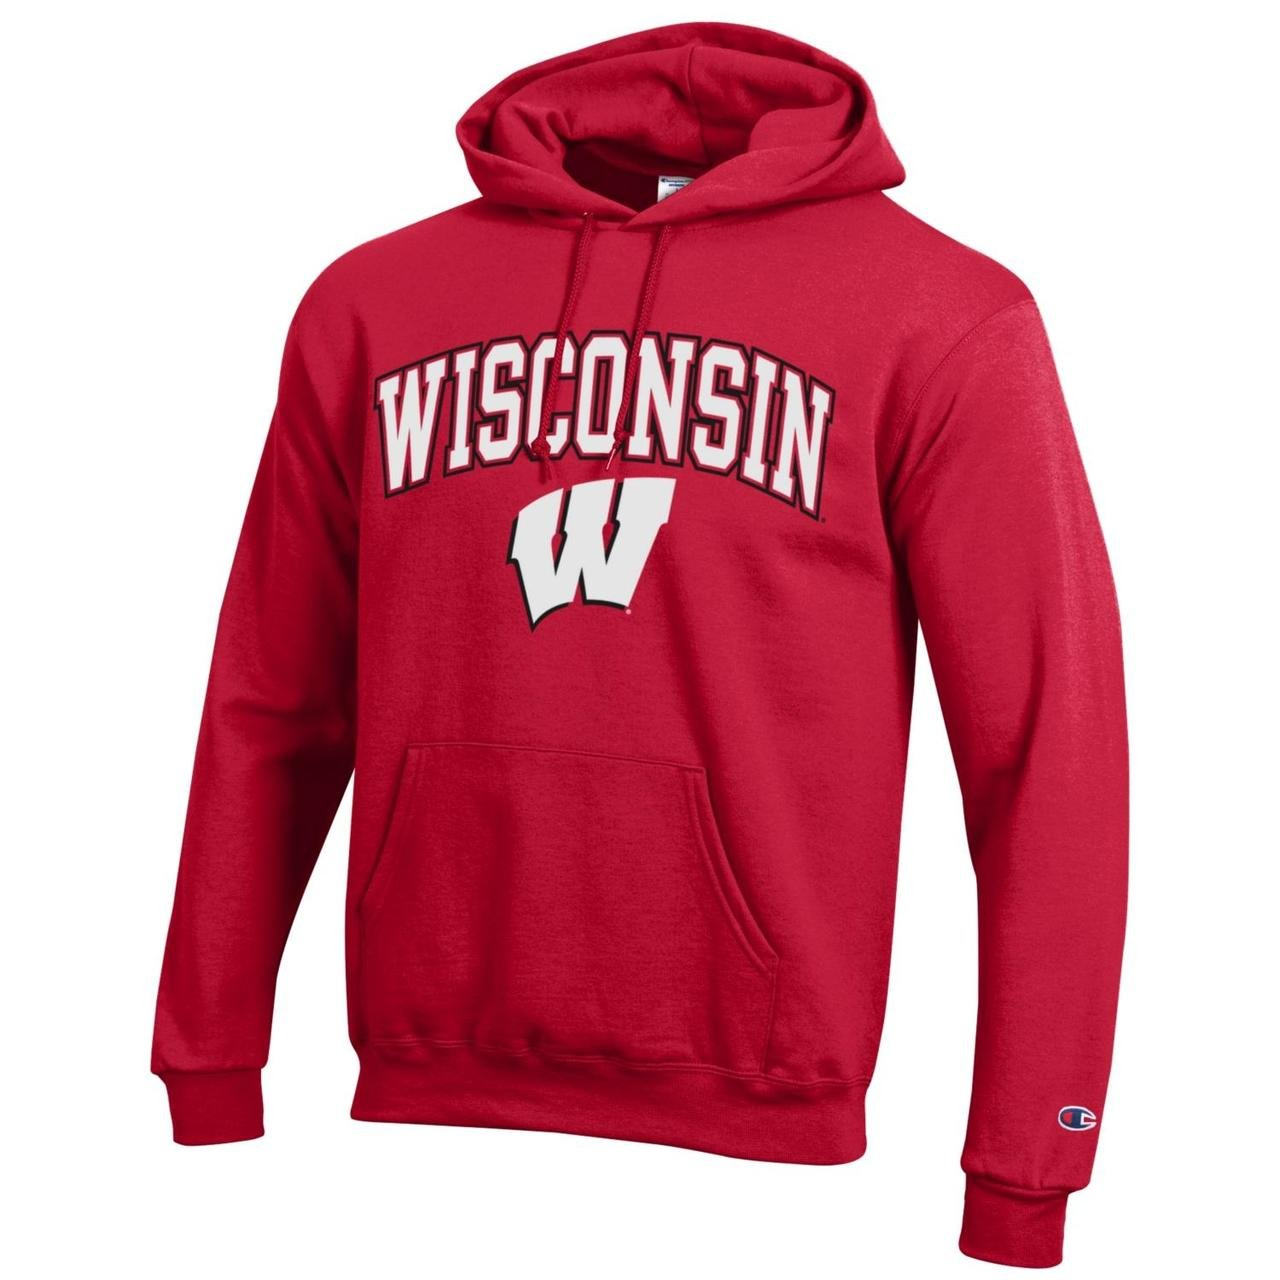 Campus Colors NCAA Adult Arch & Logo Gameday Hooded Sweatshirt...